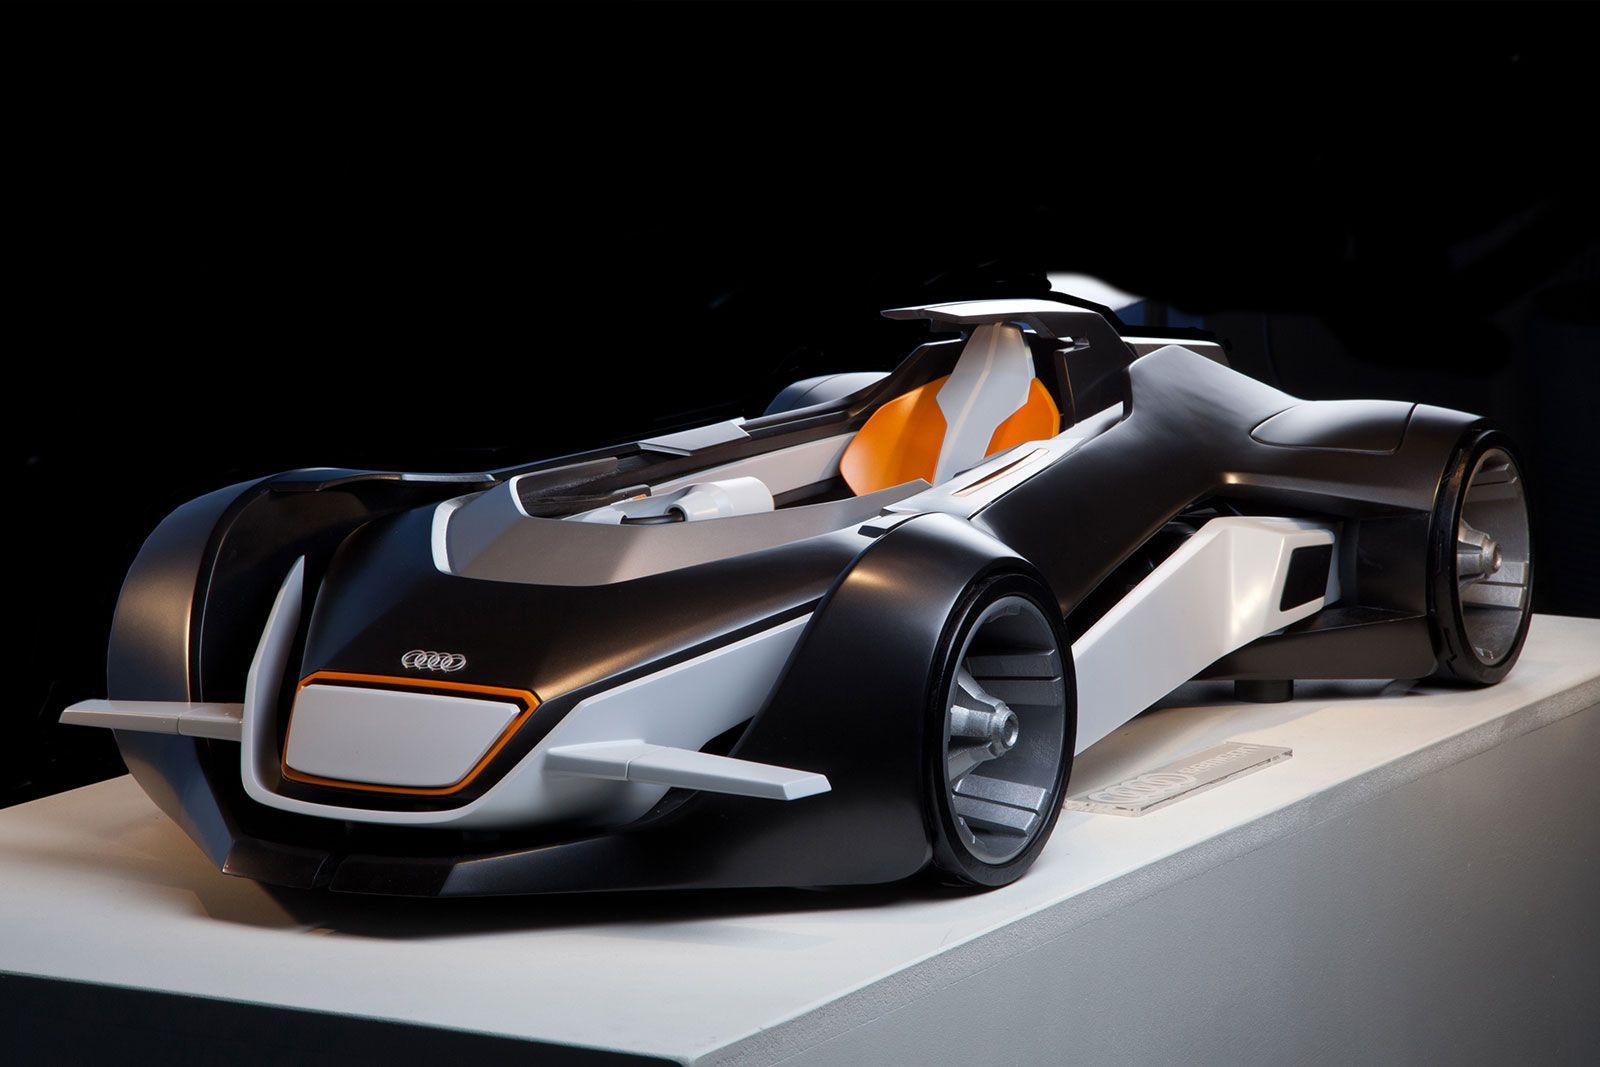 Audi Elite Concept Scale Model Car Body Design Audi Super Cars Car Model